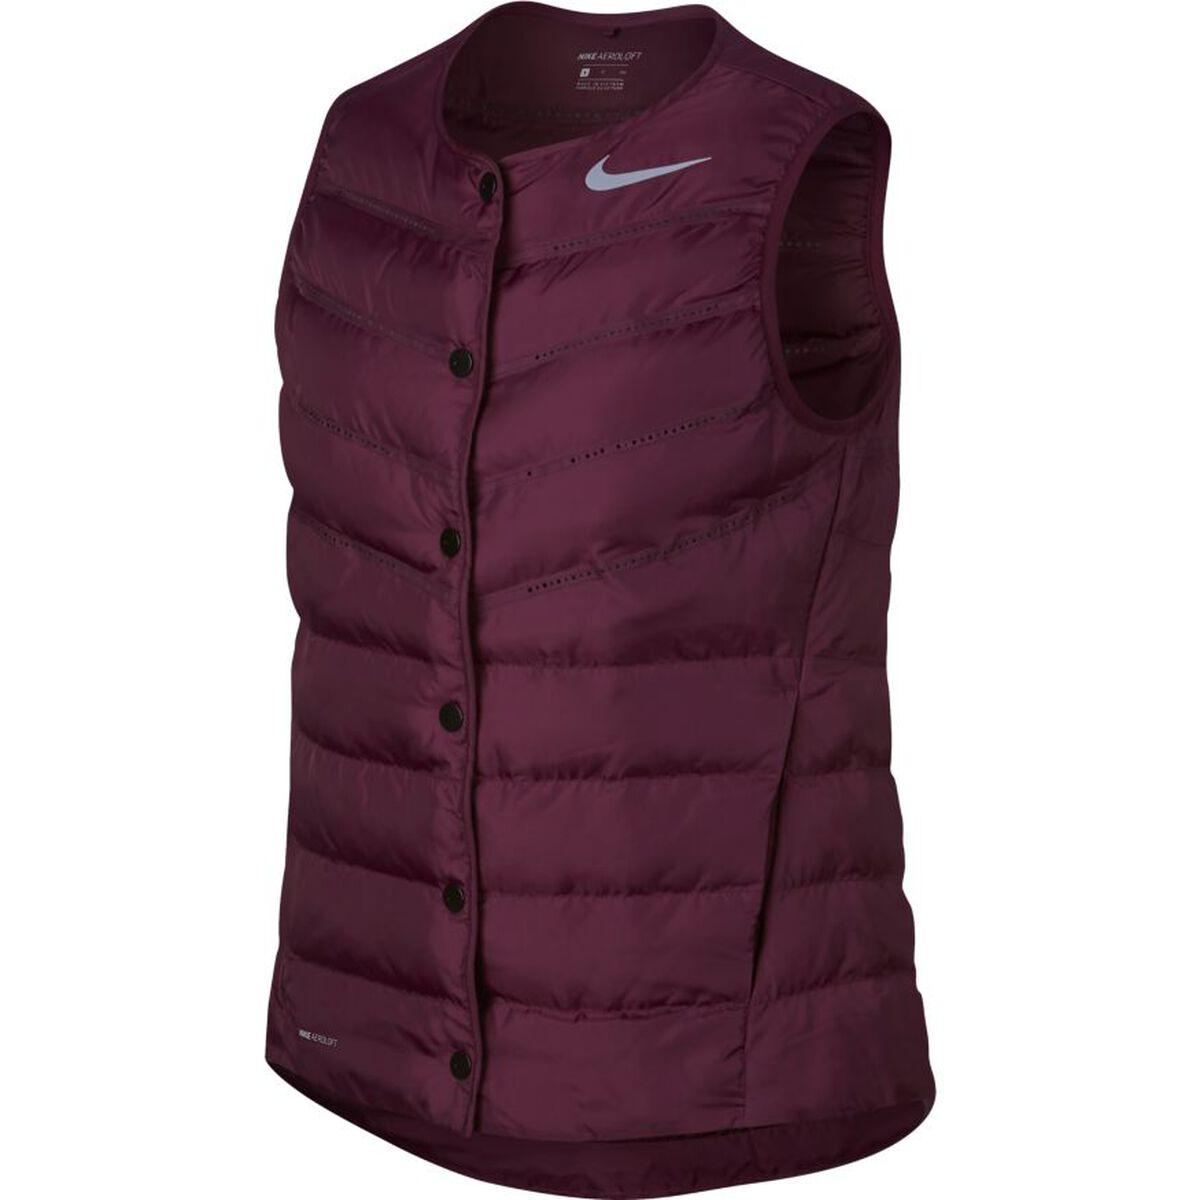 Images. Nike Women  39 s AeroLoft Golf Vest e5a6a2cd4